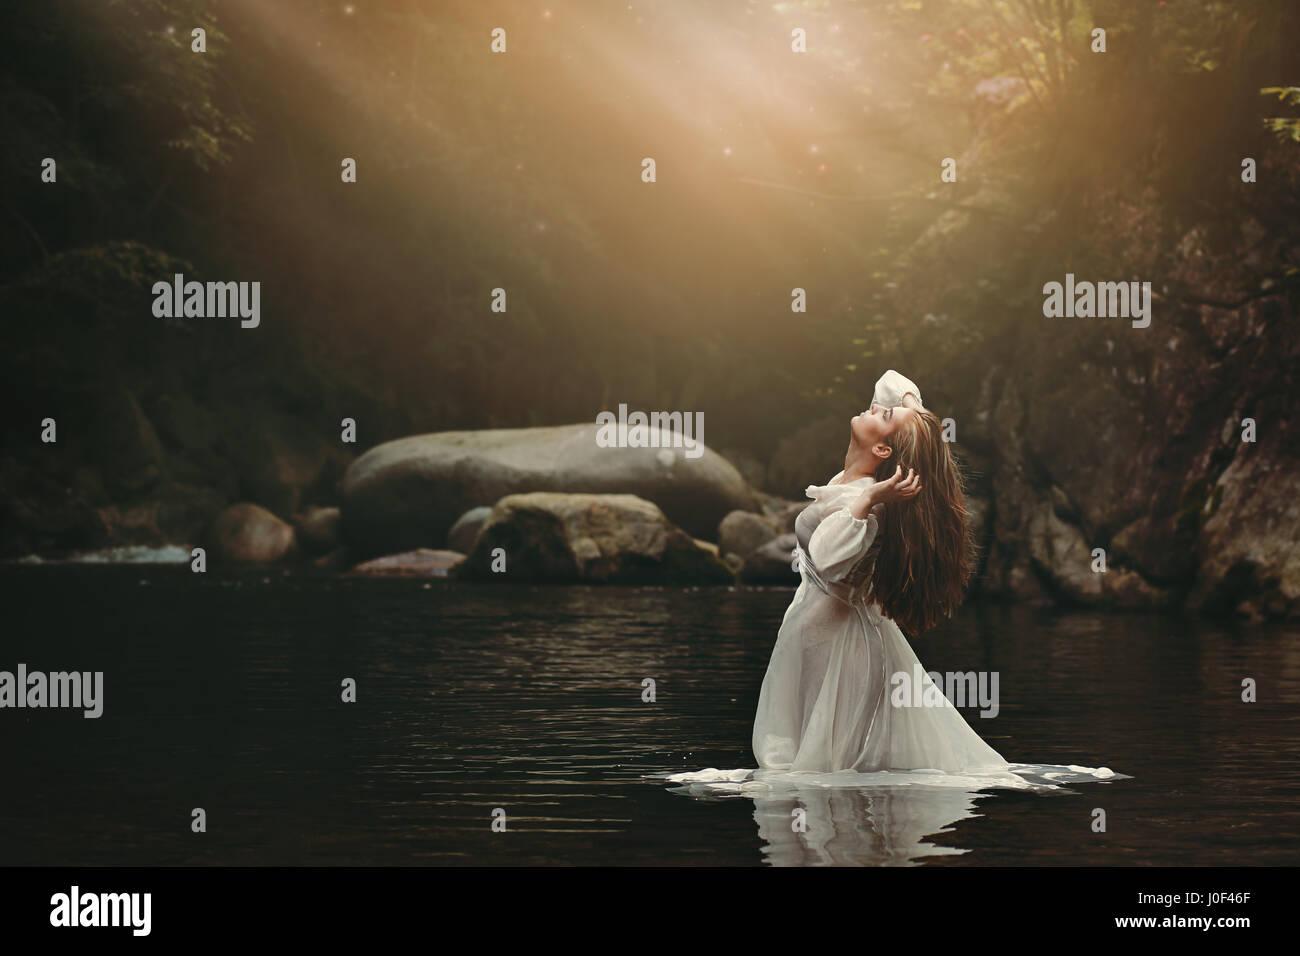 Schöne junge Frau in Fee-Teich. Dark fantasy Stockbild